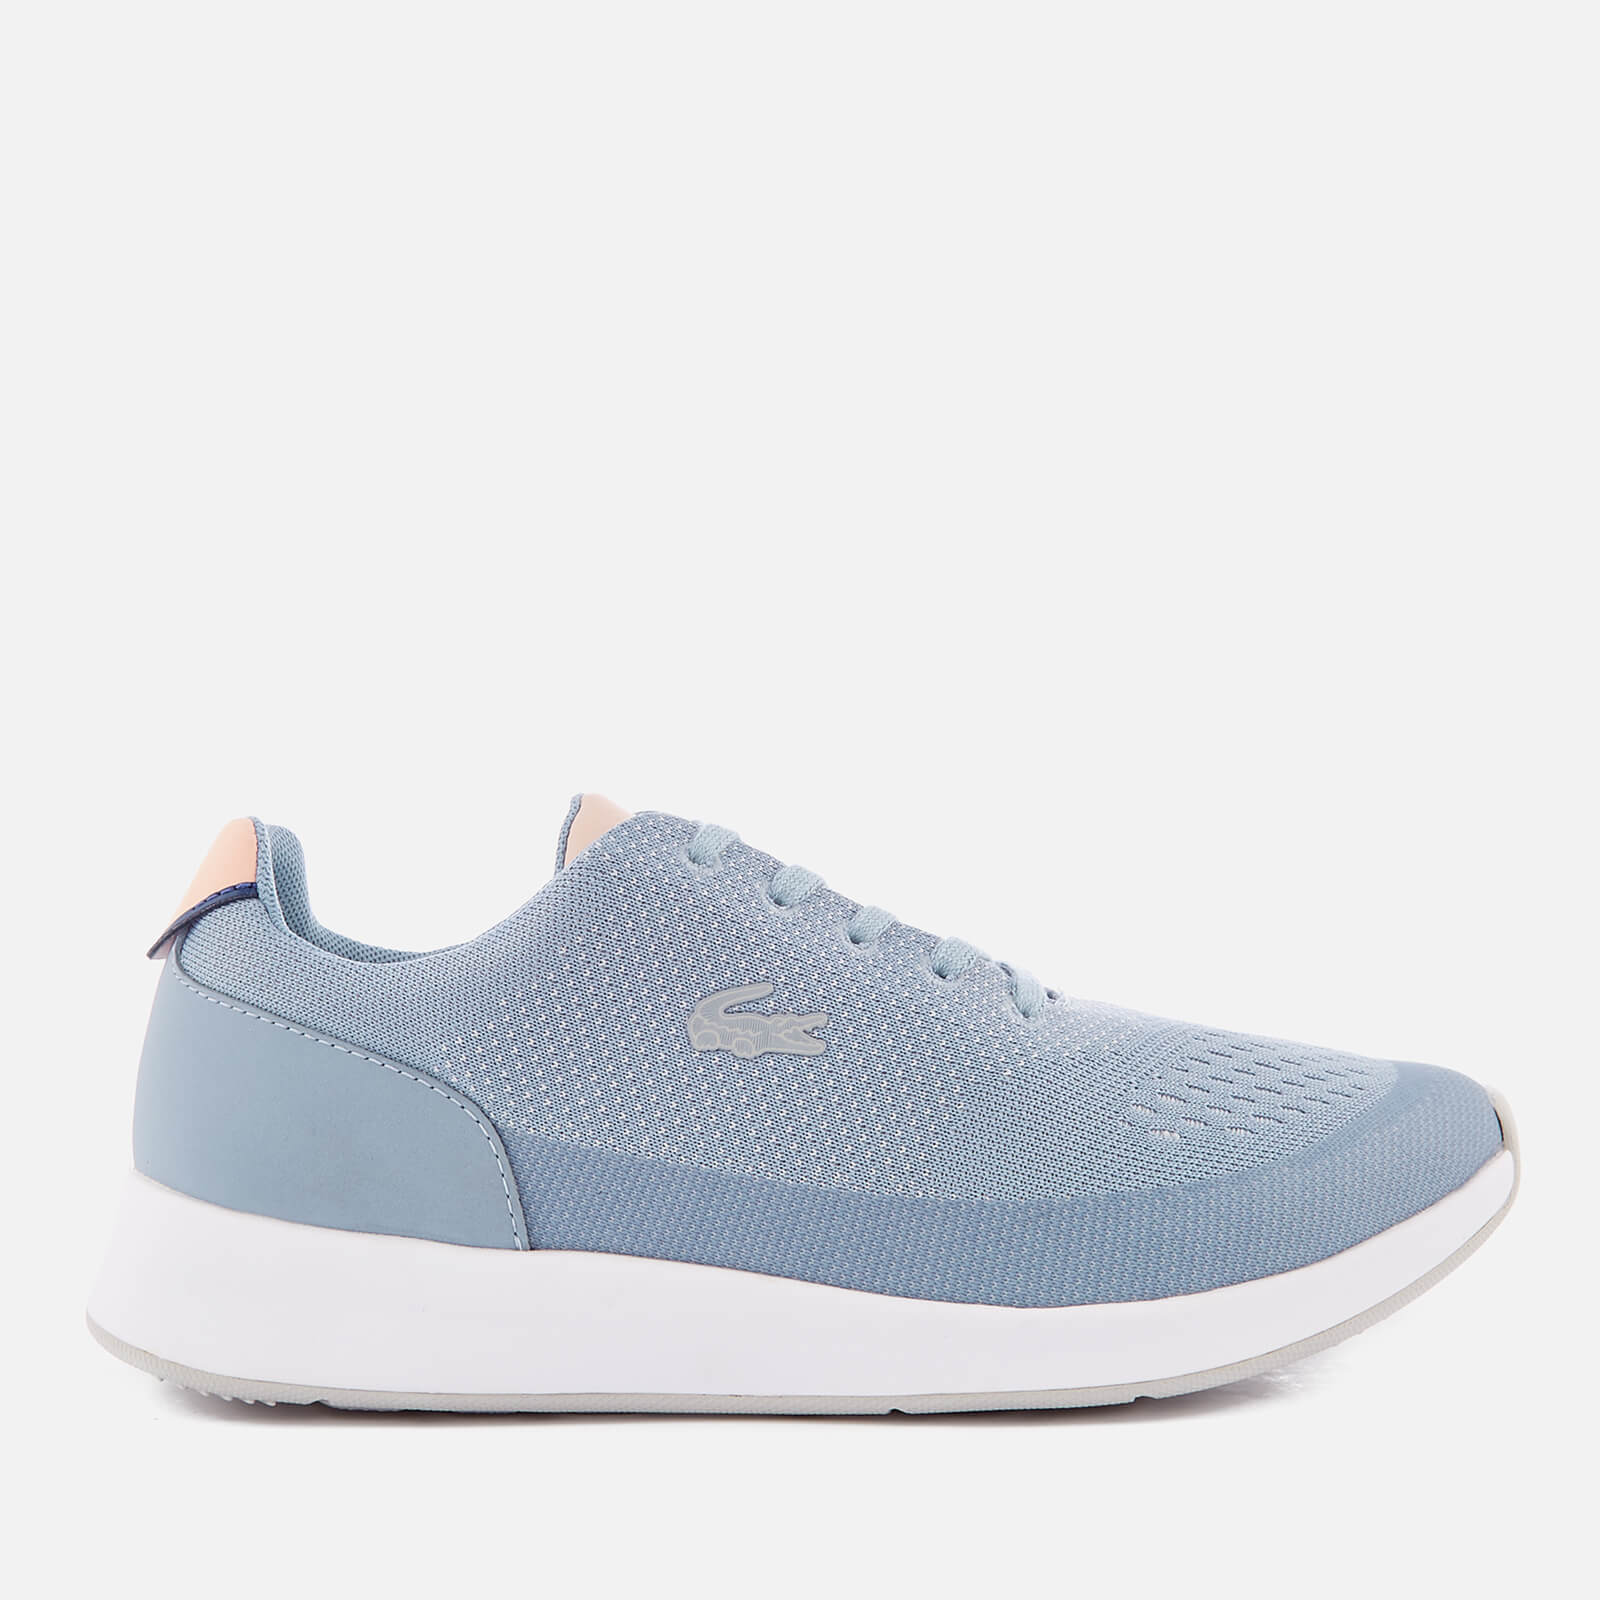 601005eed8b36 Lacoste Women's Chaumont 118 3 Runner Trainers - Light Blue/Light Pink  Womens Footwear   TheHut.com